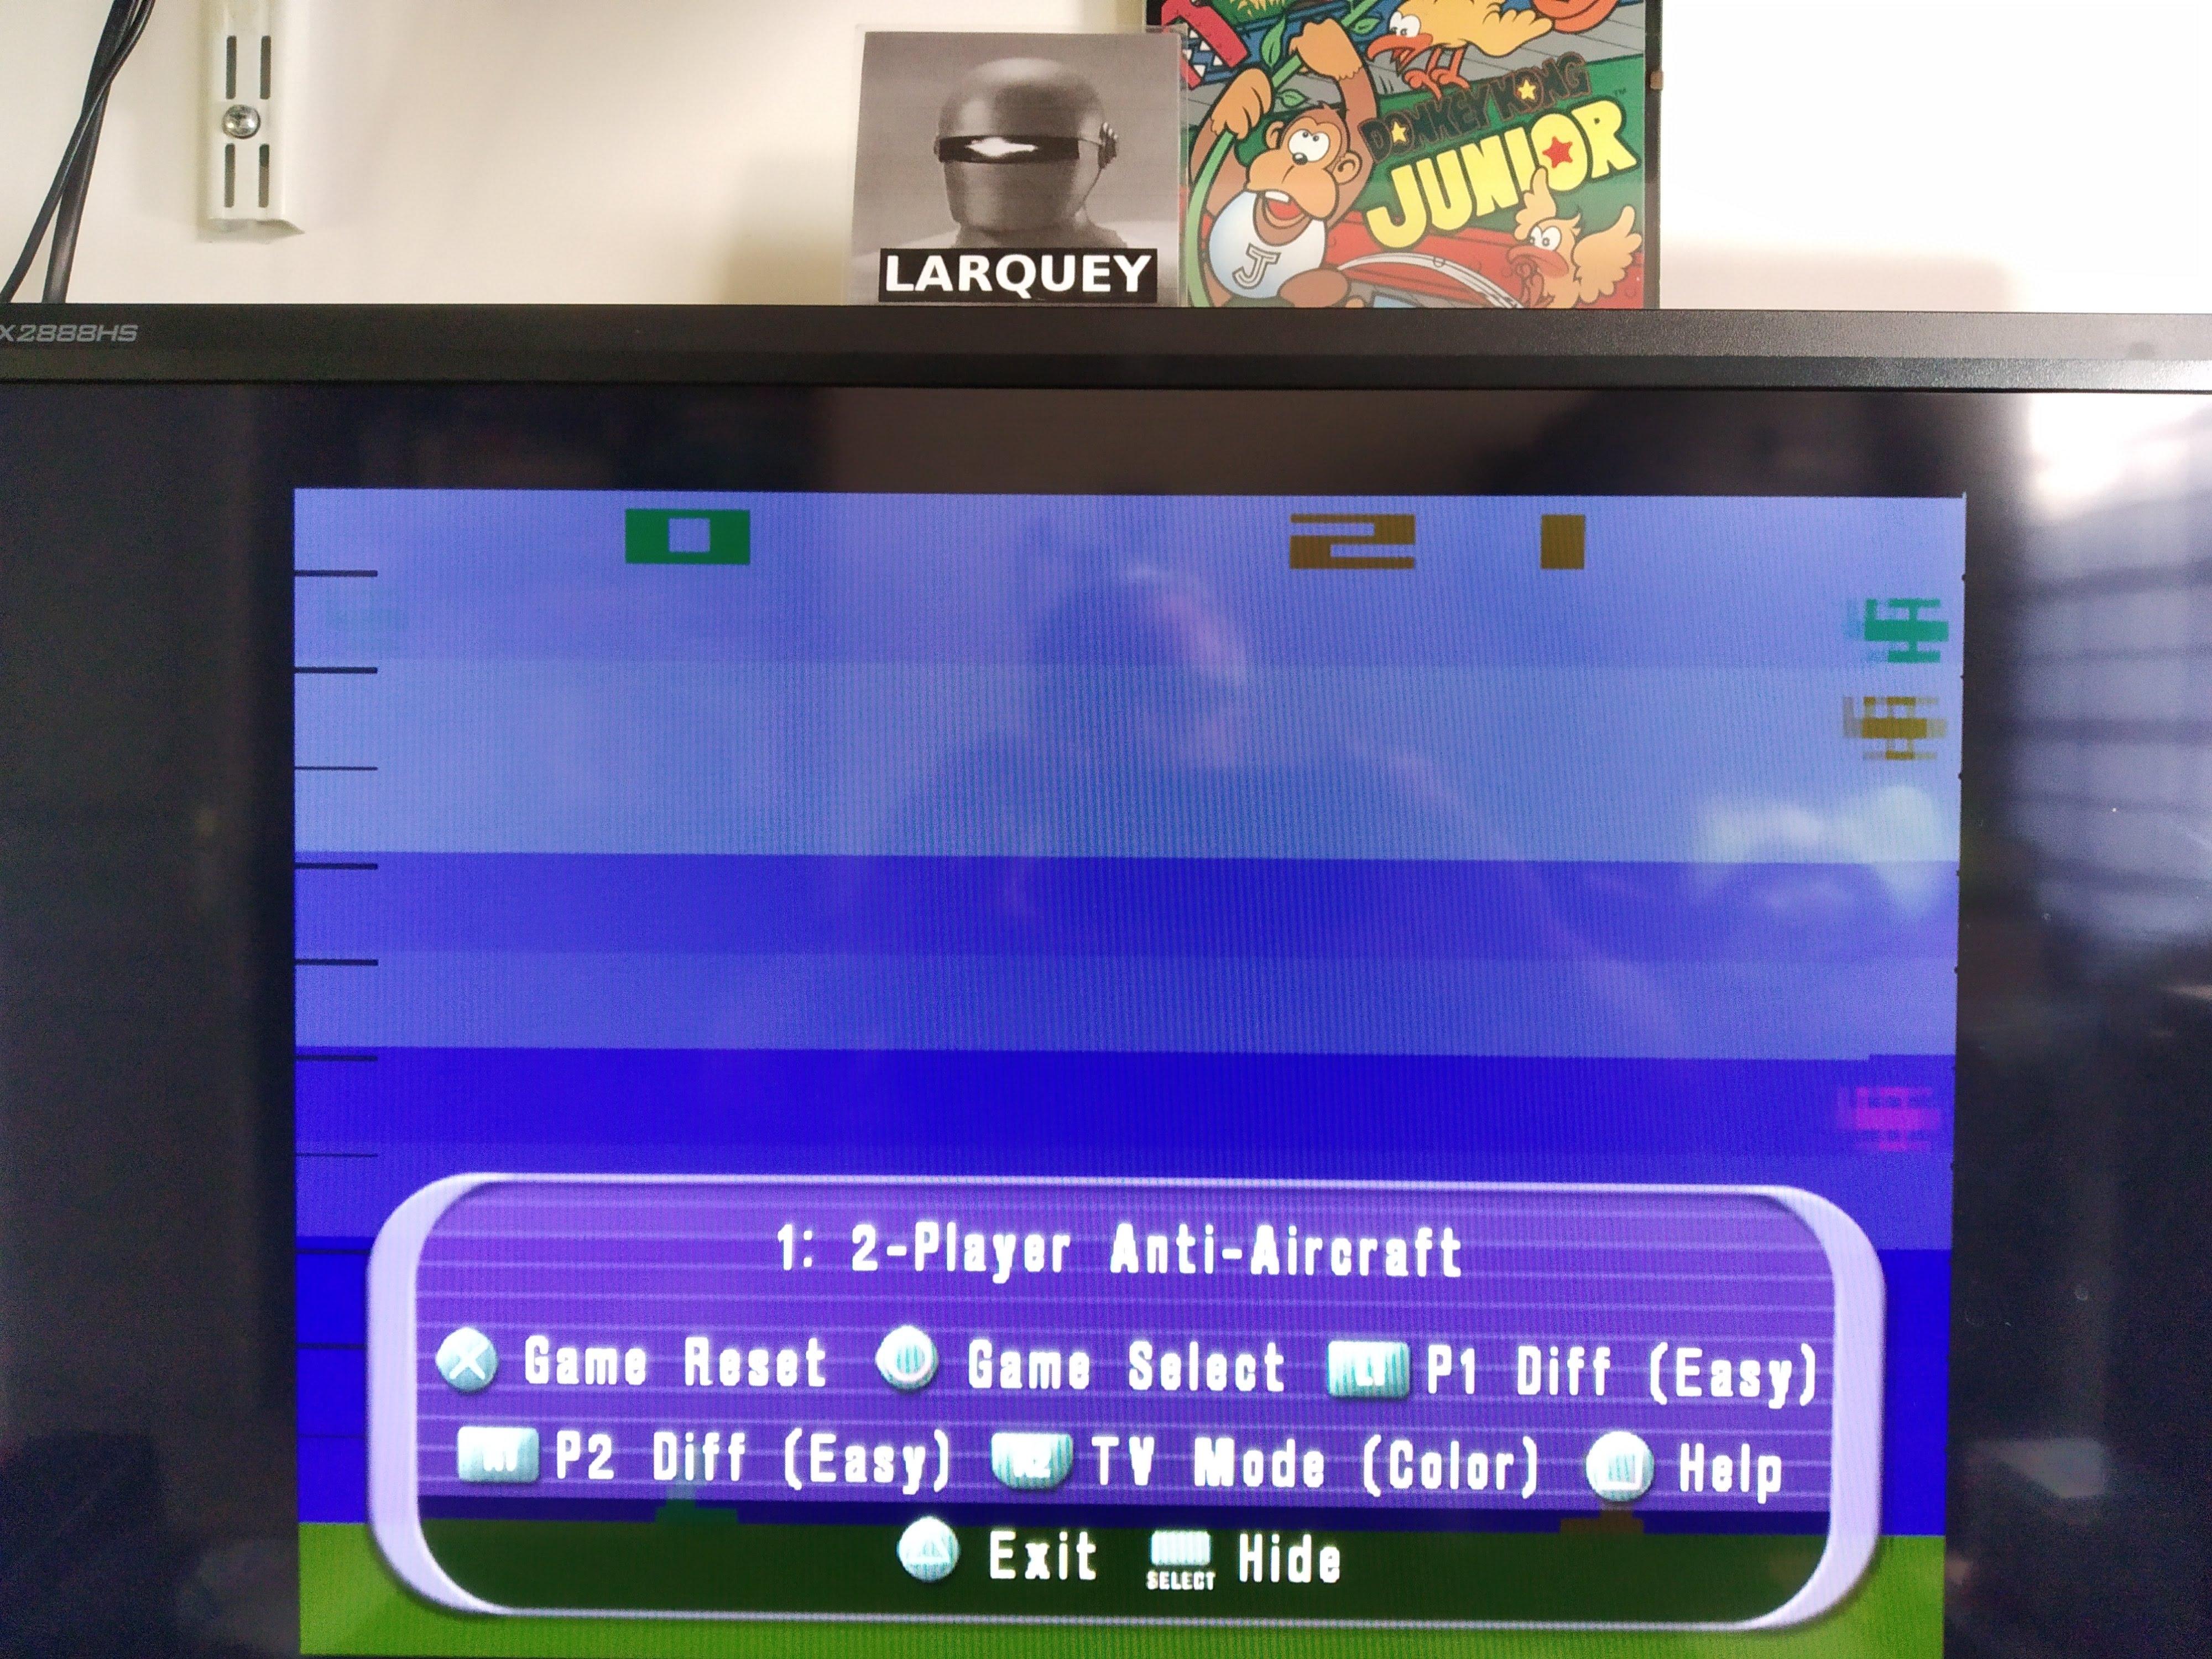 Larquey: Atari Anthology: Air-Sea Battle [Game 1B] (Playstation 2 Emulated) 21 points on 2020-08-03 13:19:33